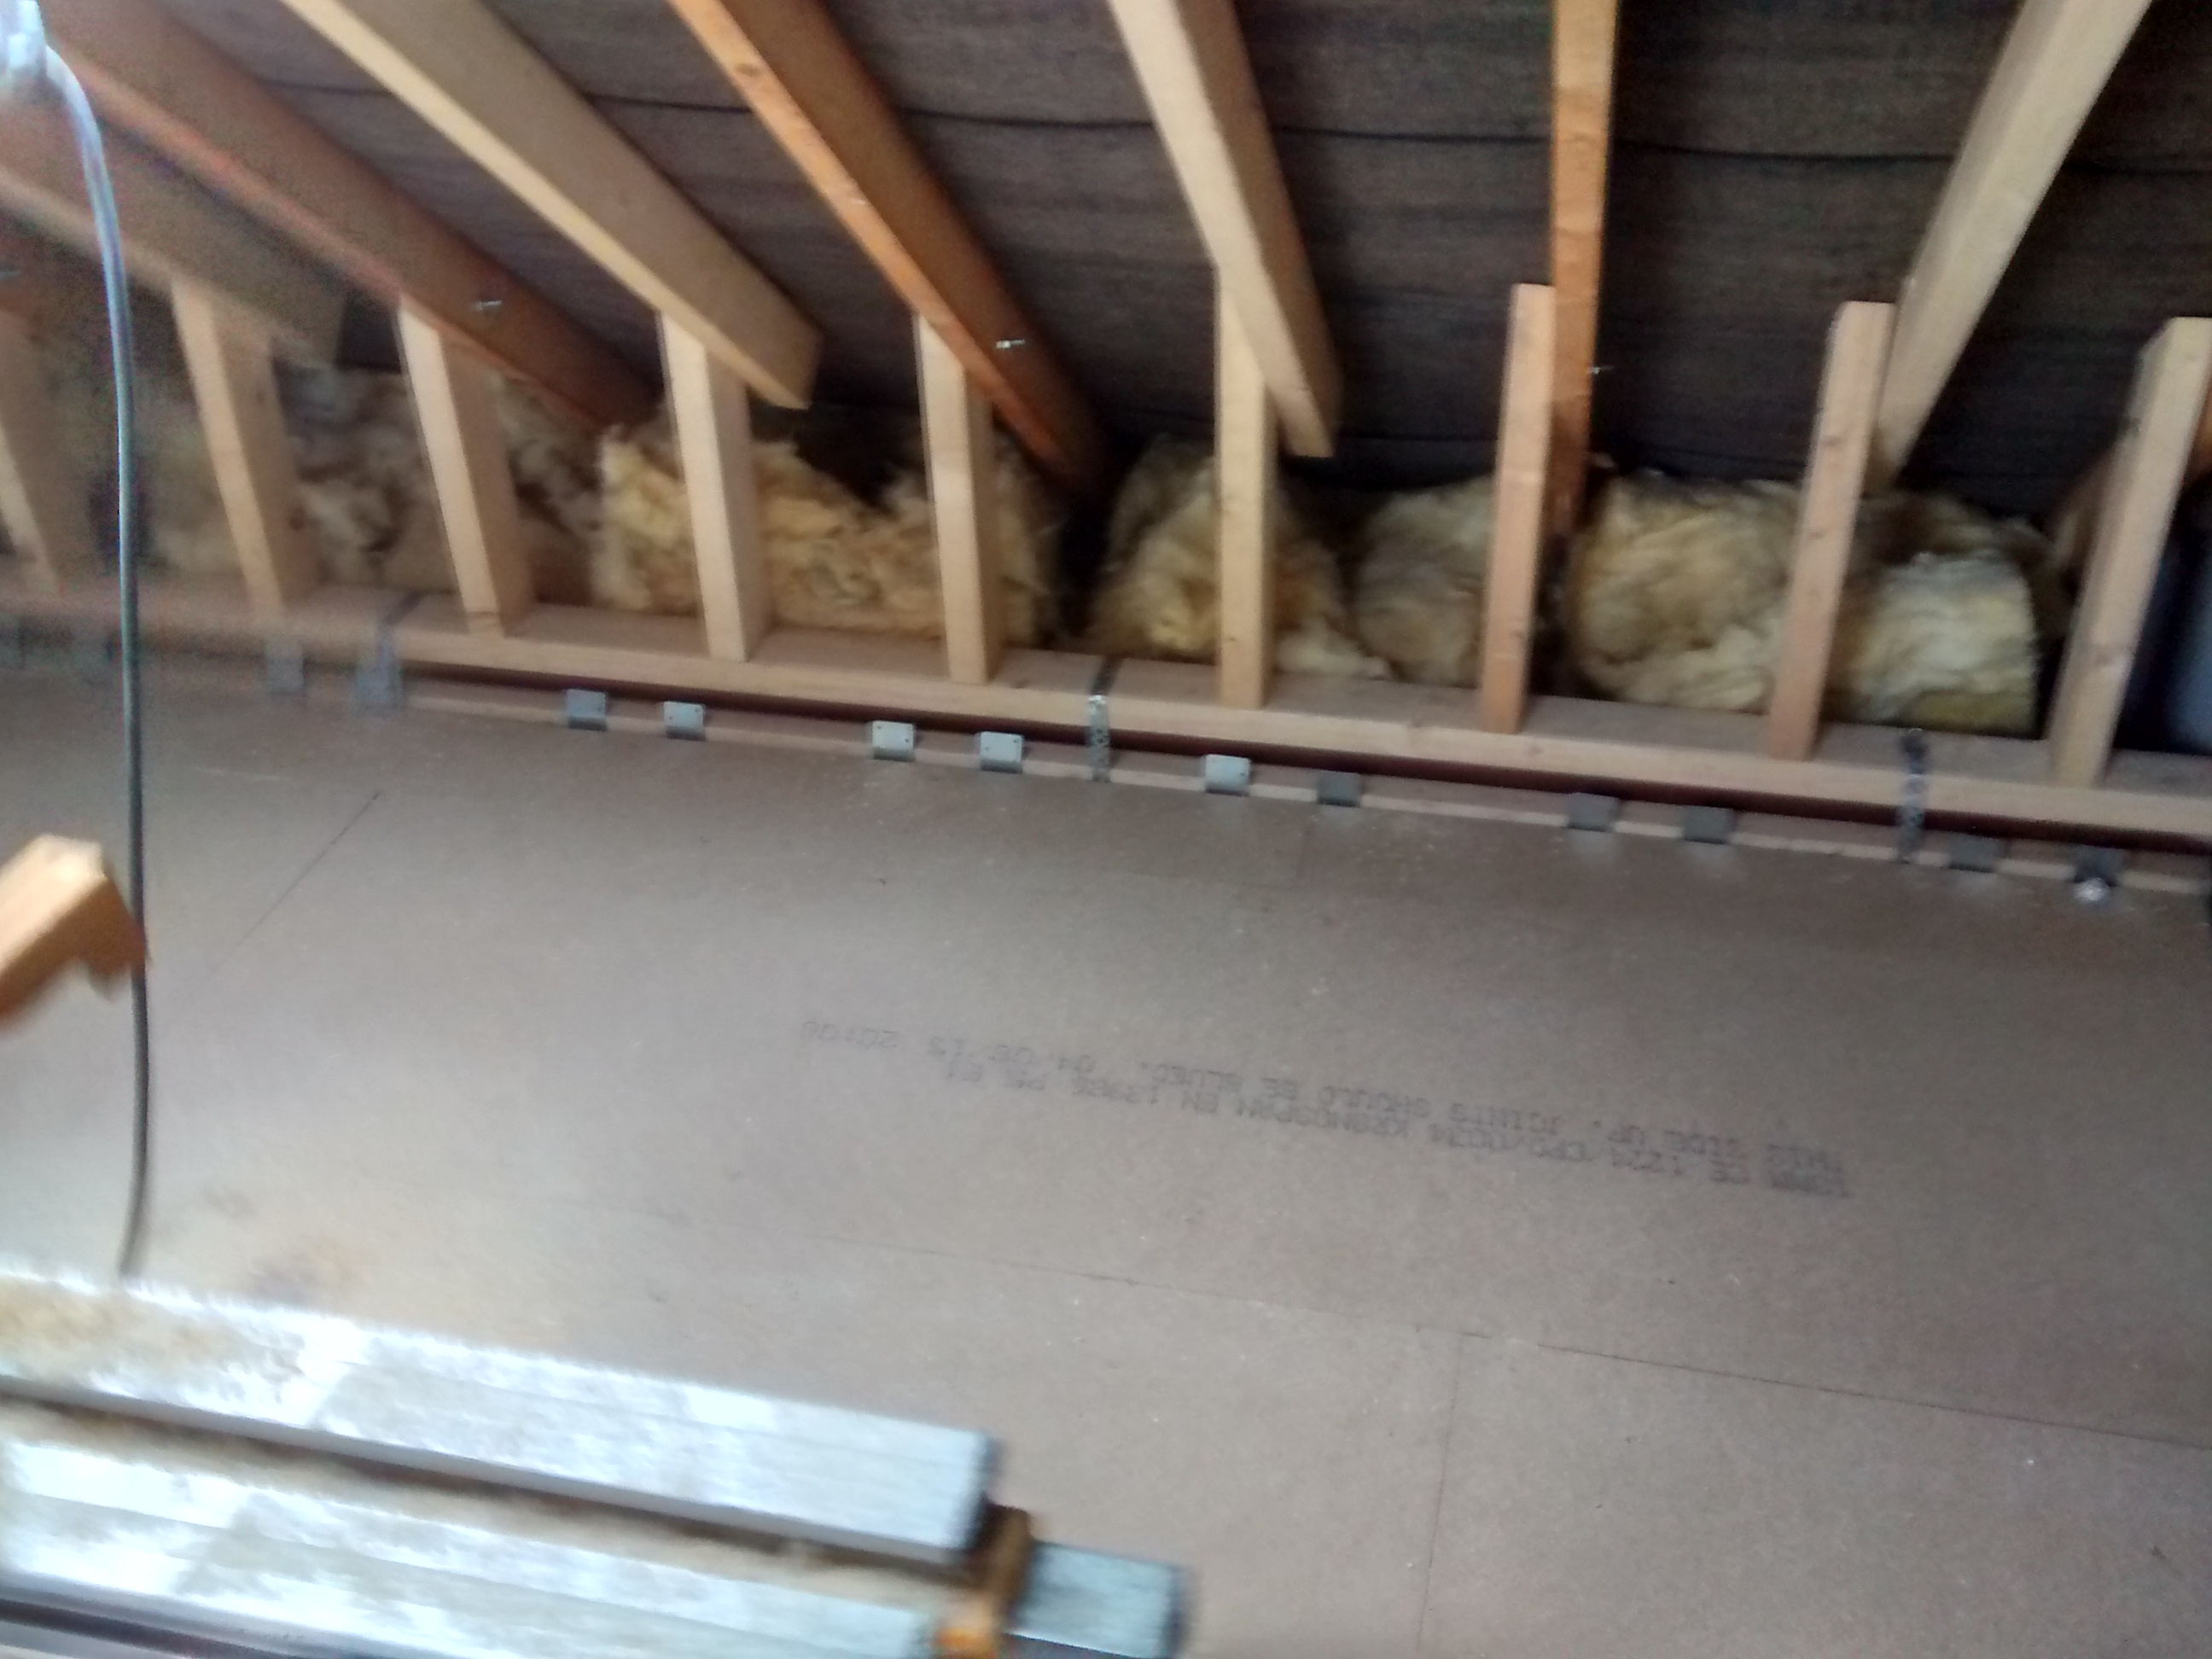 ... floorboards in loft ... & Floorboards Installed  Insulation and Plumbing Started - Loft Week ...